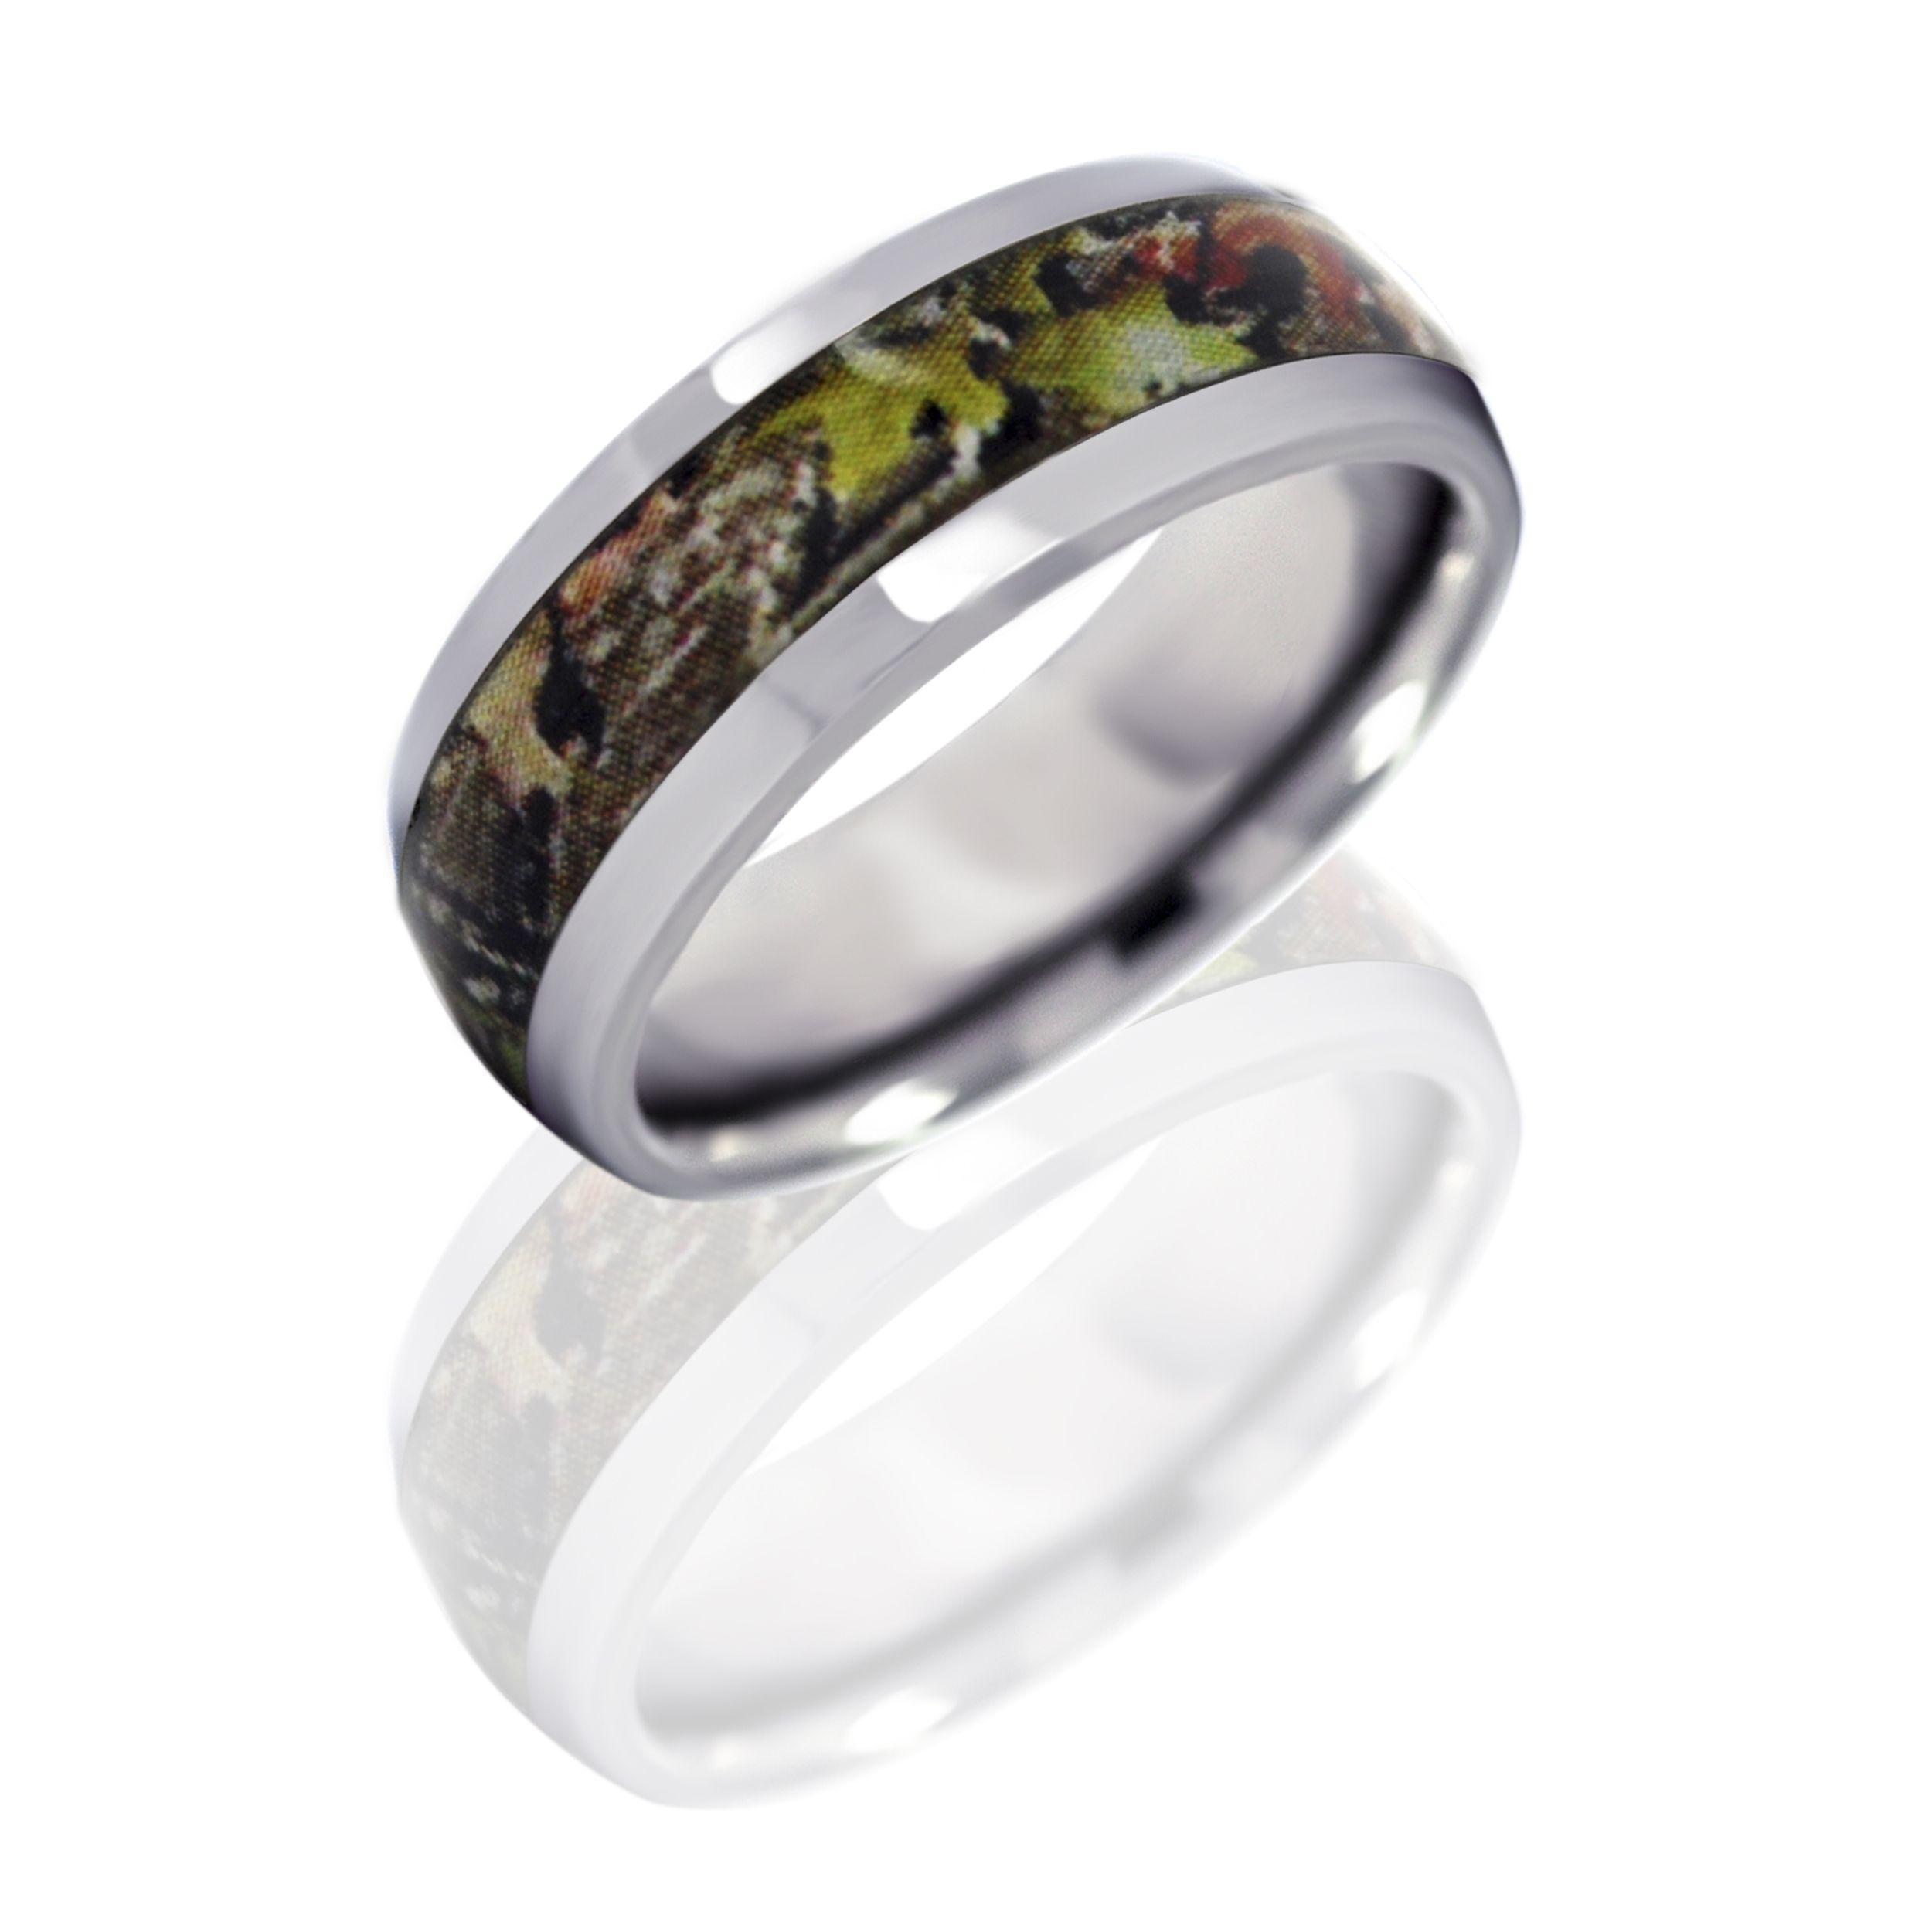 Camo and orange wedding dresses  Camo Wedding Cakes Mossy Oak   titanium flat mossy oak obsession